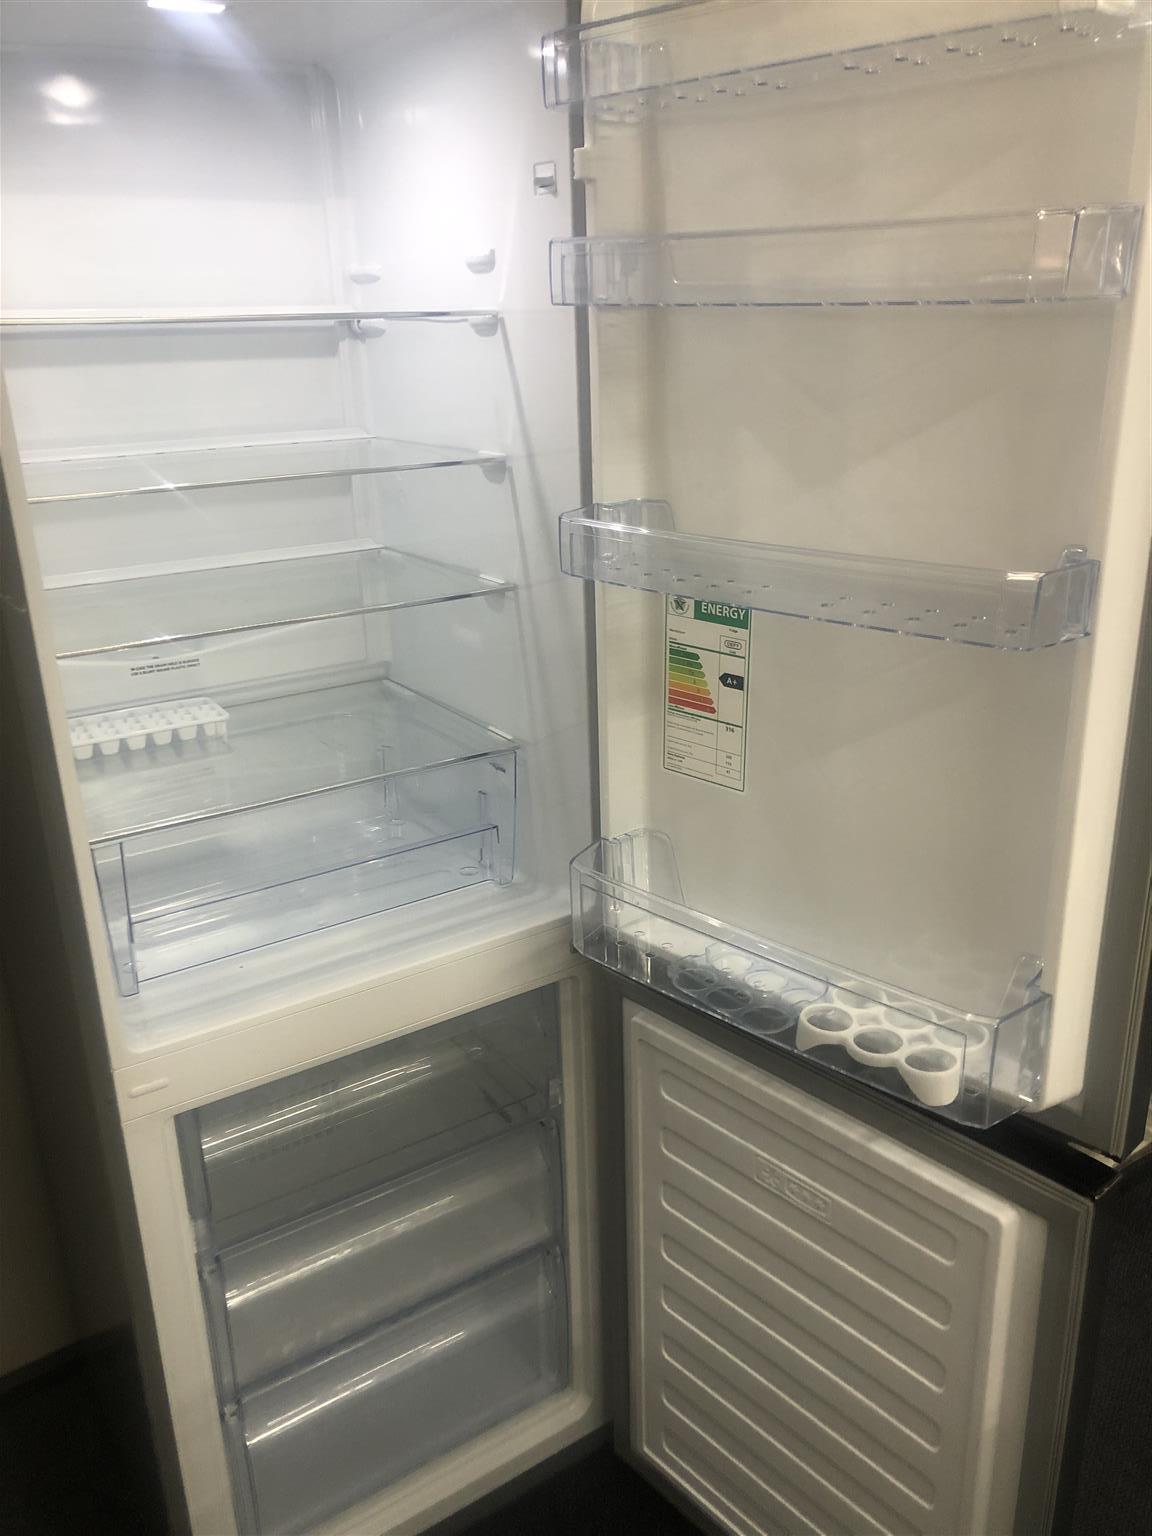 Fridge / Freezer Defy